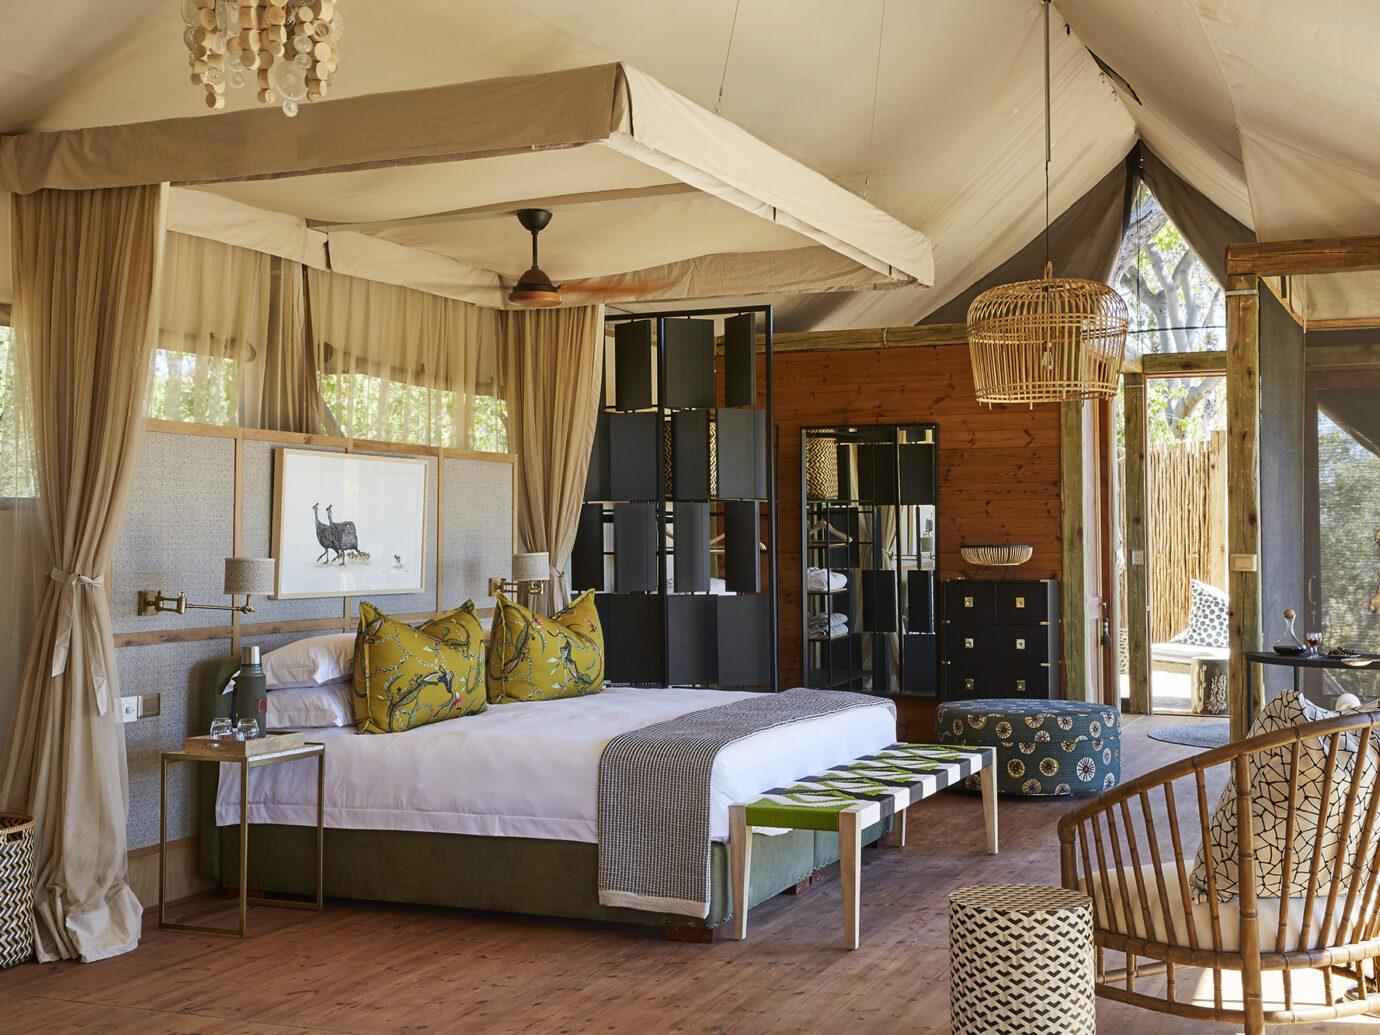 Bedroom at Tuludi Camp, Botswana